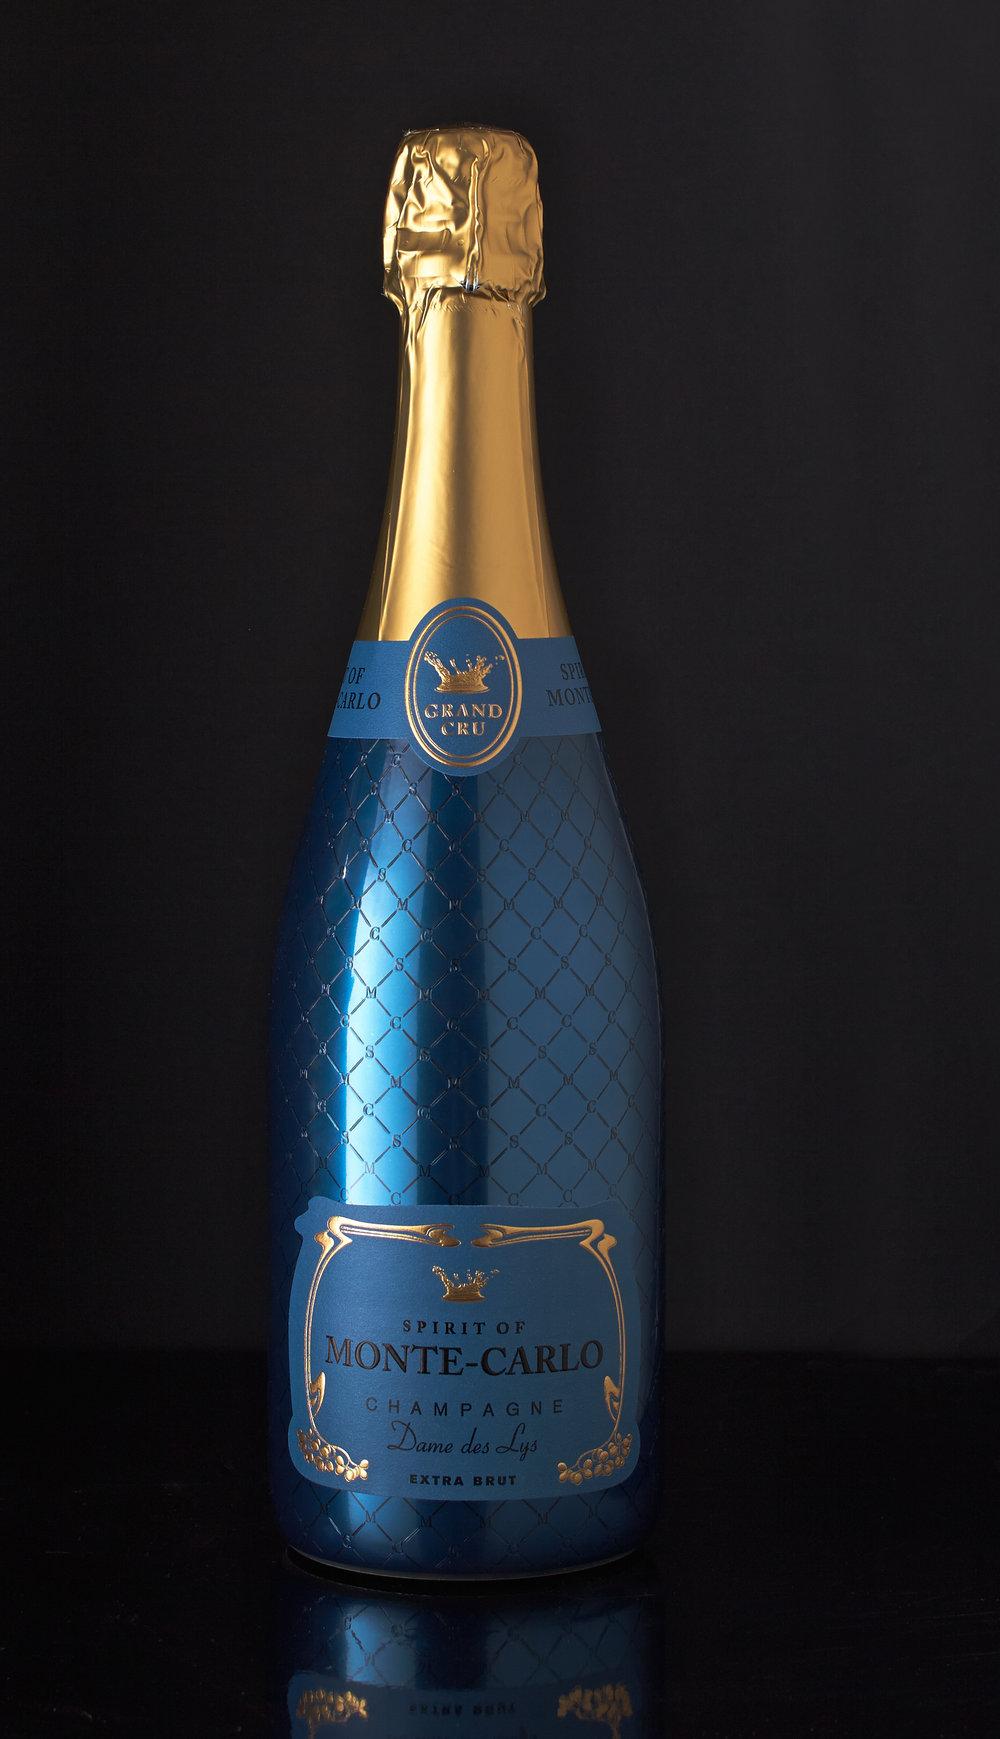 01_Champagne Montecarlo still life7937.jpg